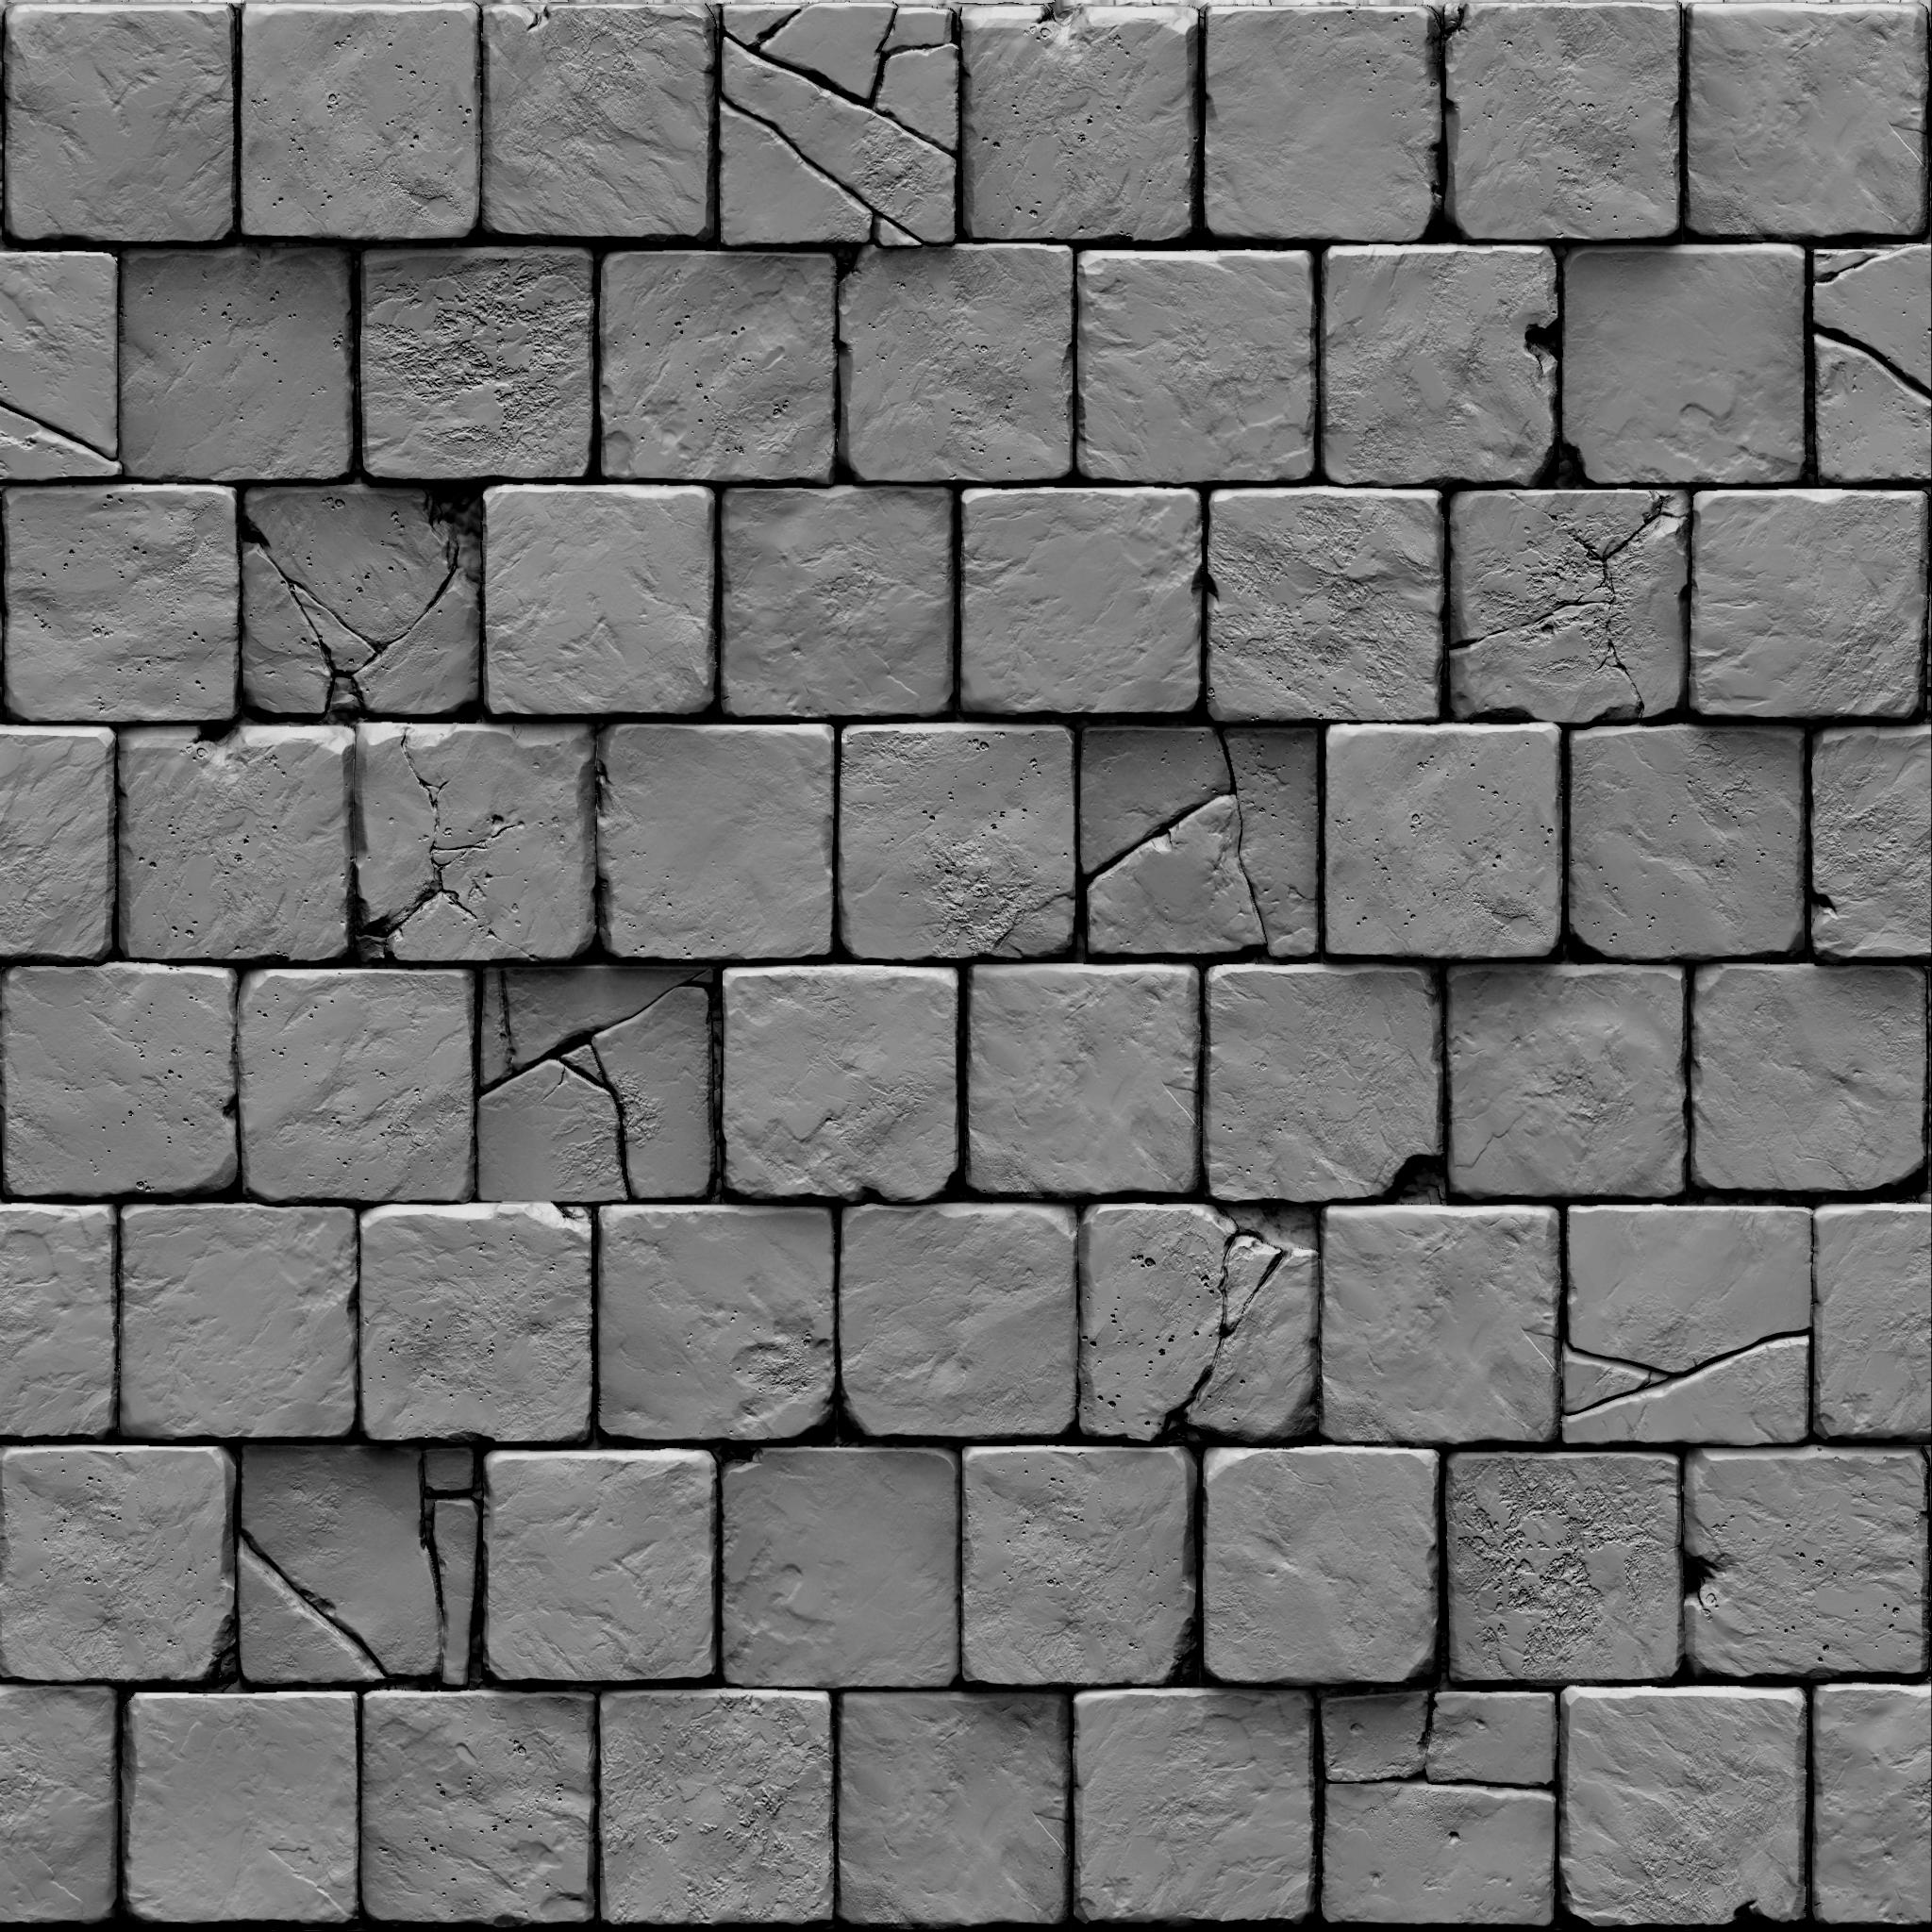 Floor Elevation Zbrush : Tileable textures jared sobotta d artist